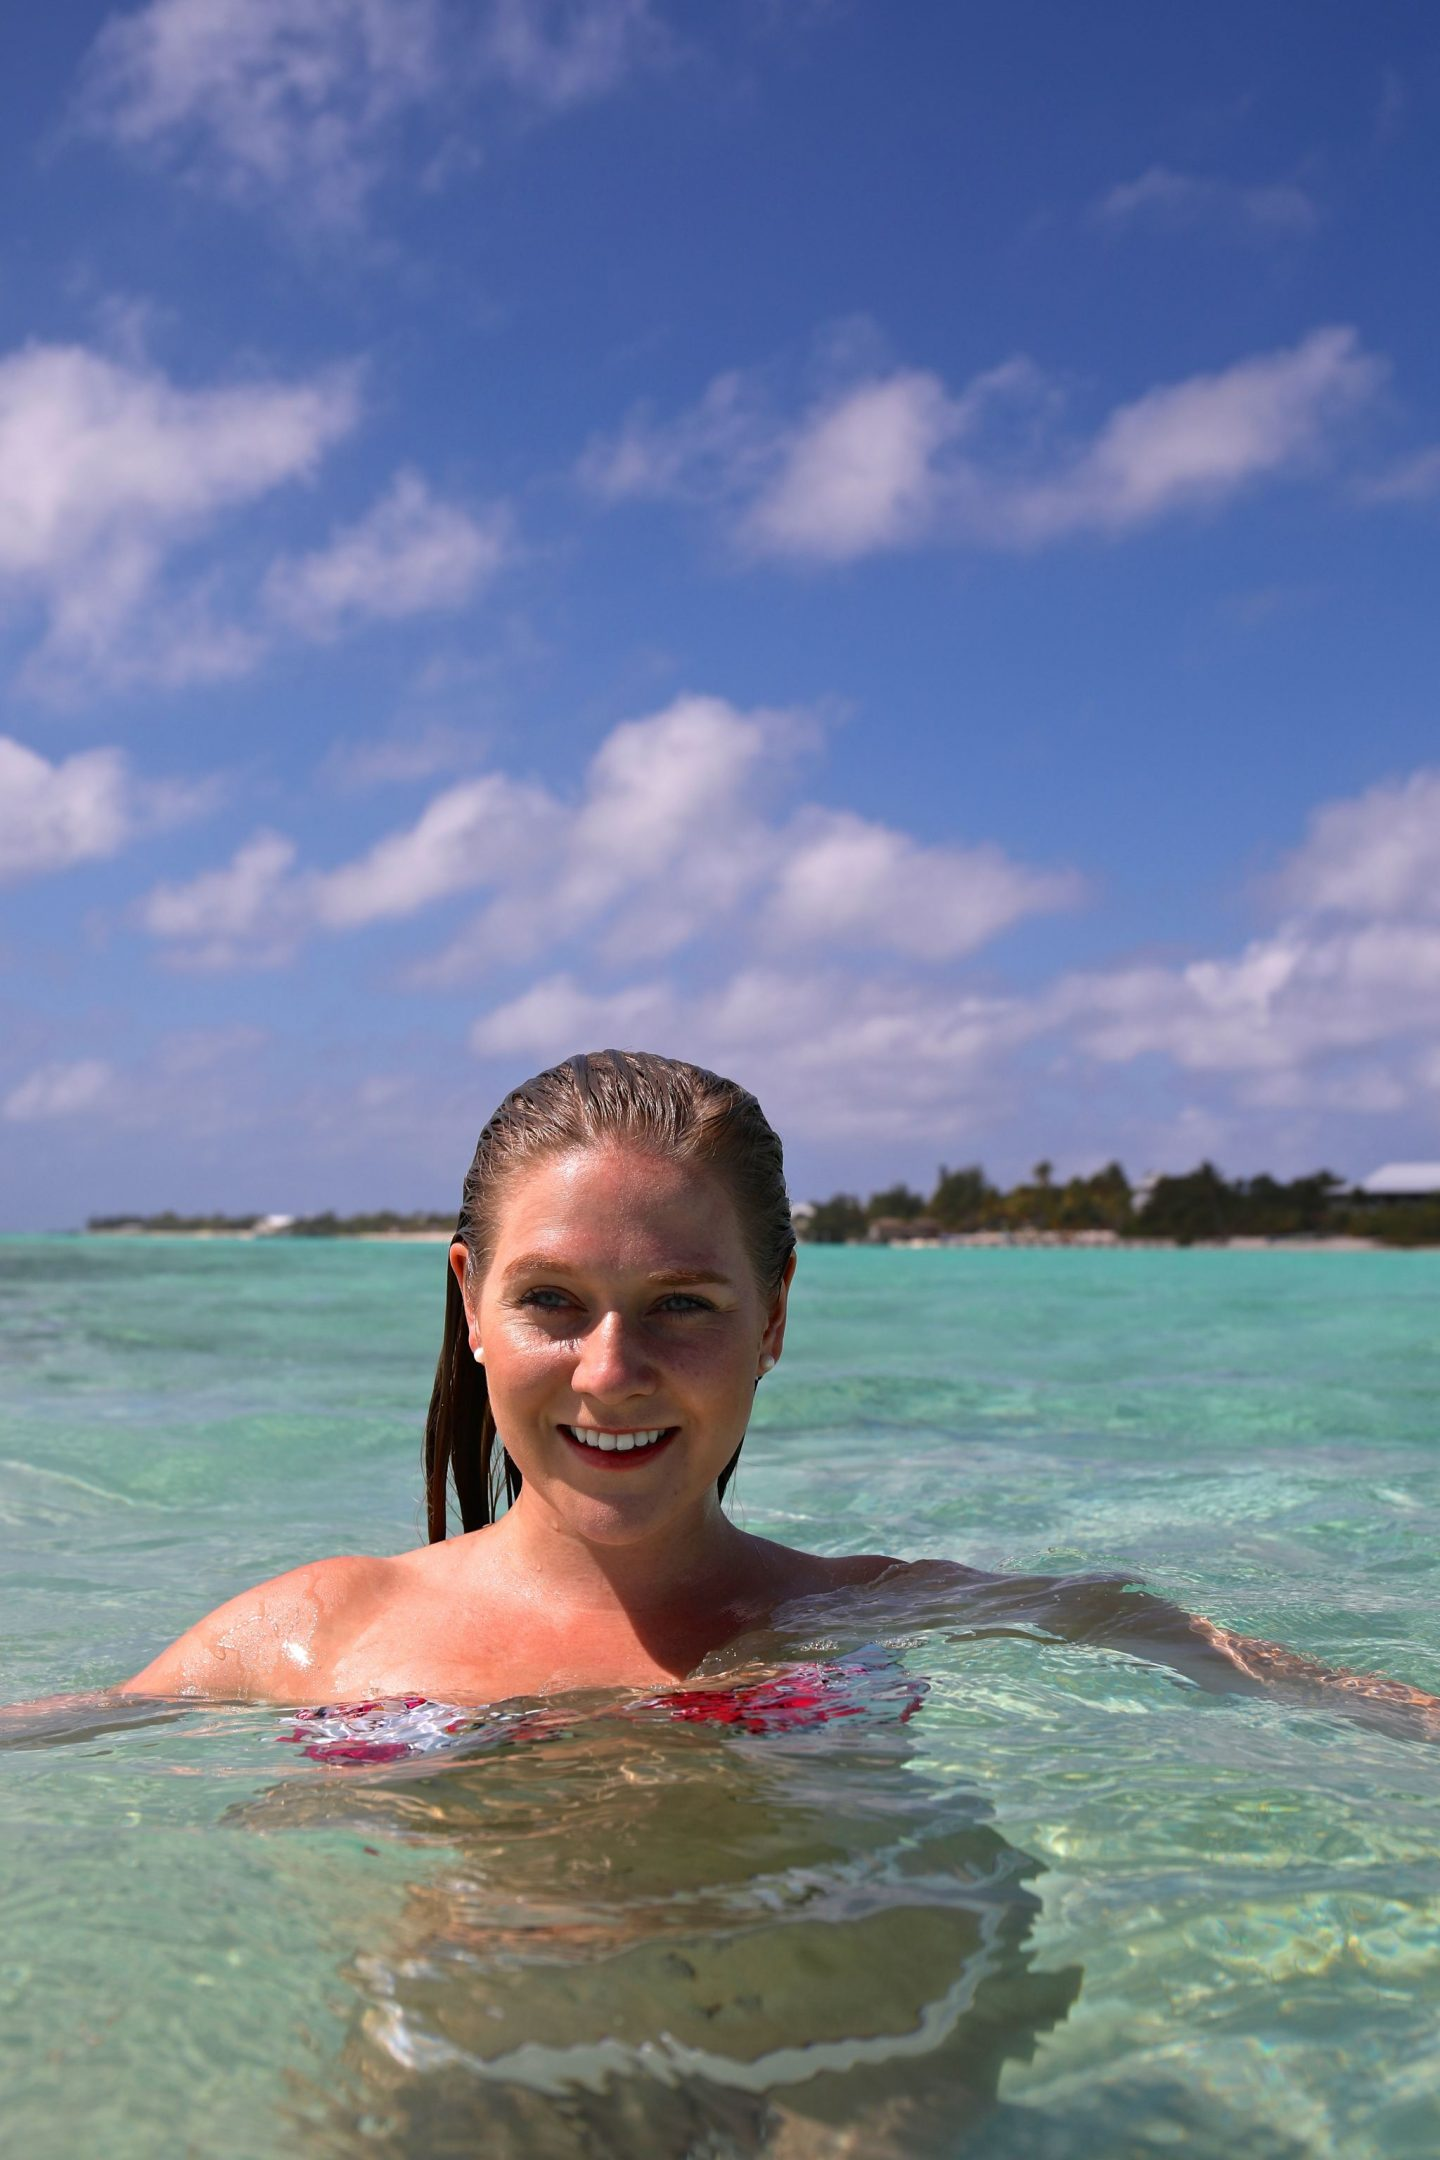 Owen Island, Little Cayman, Katie Heath, KALANCHOE